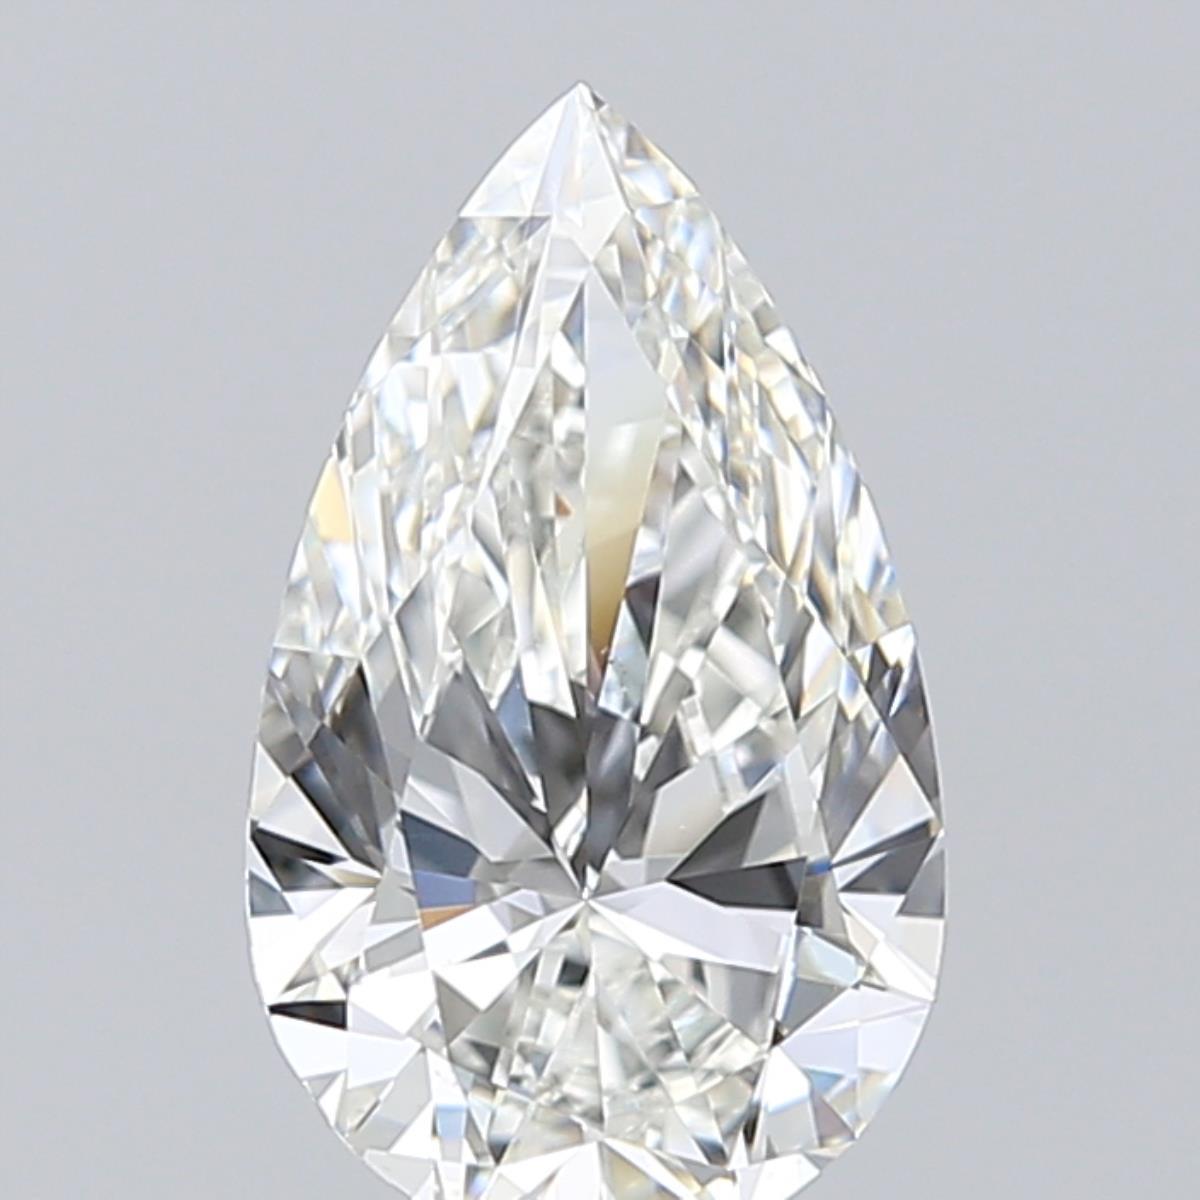 1.51-Carat Natural Ideally Cut Pear Diamond